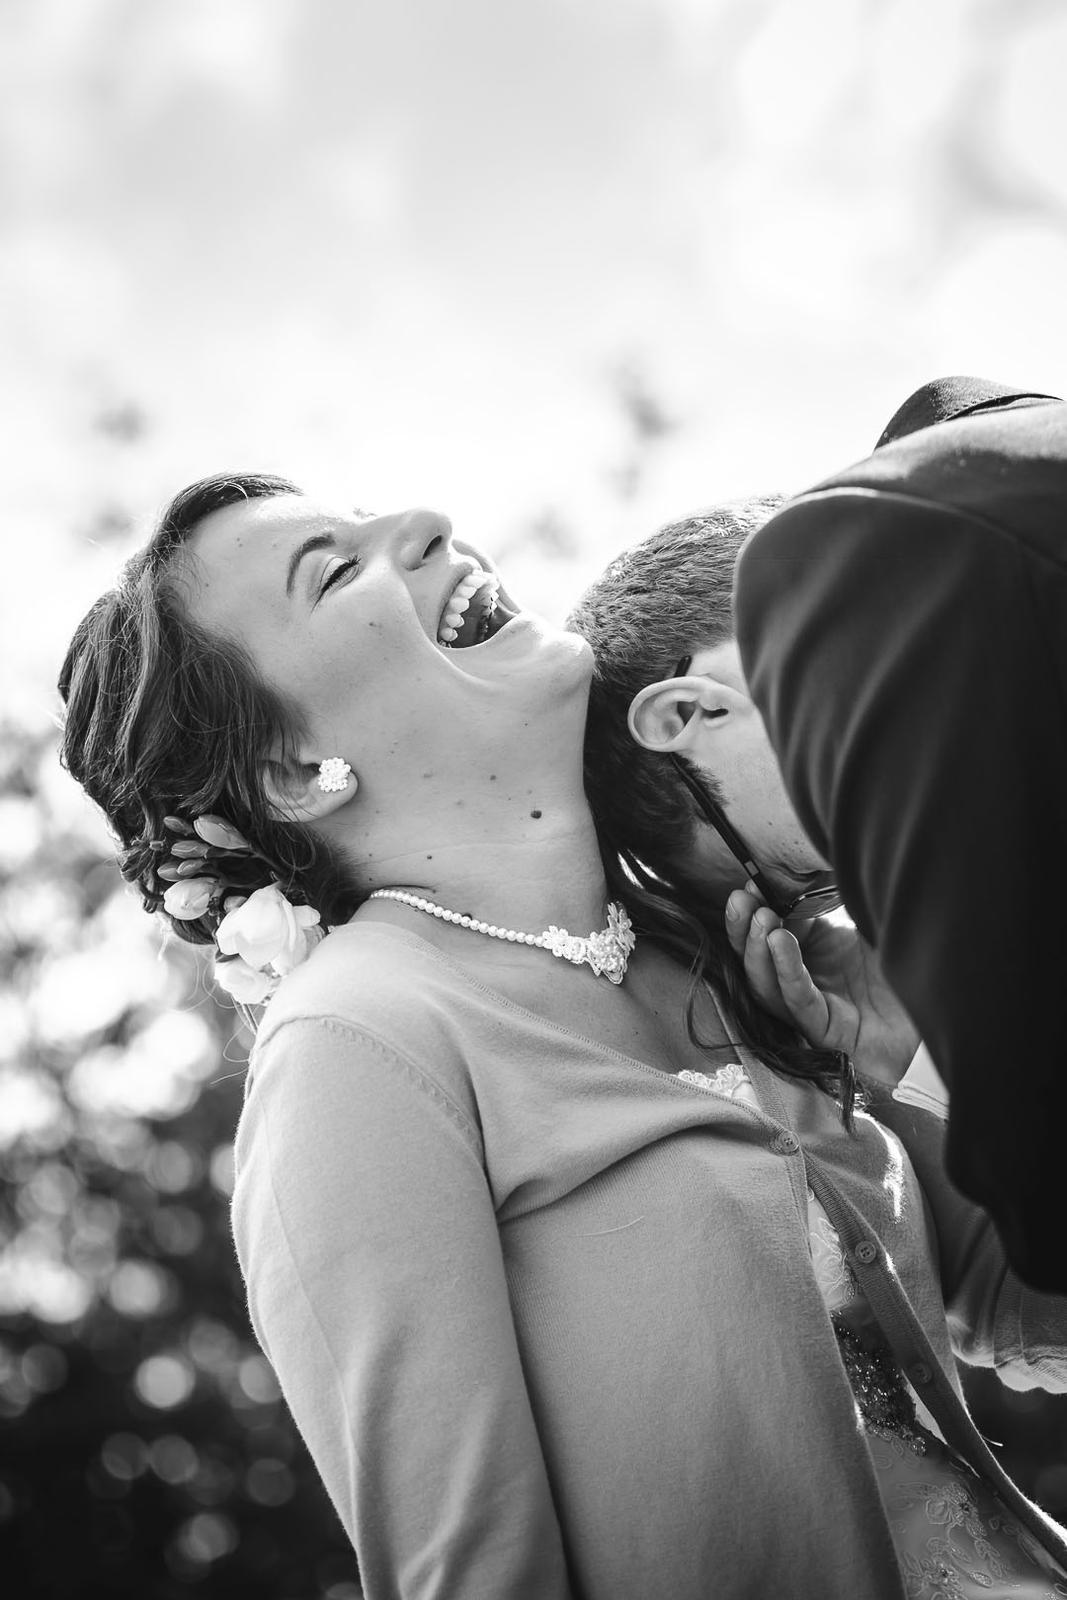 Lucia{{_AND_}}Peter - fotograf: tvarte sa aspon chvilu romanticky...a takto to dopadlooo...